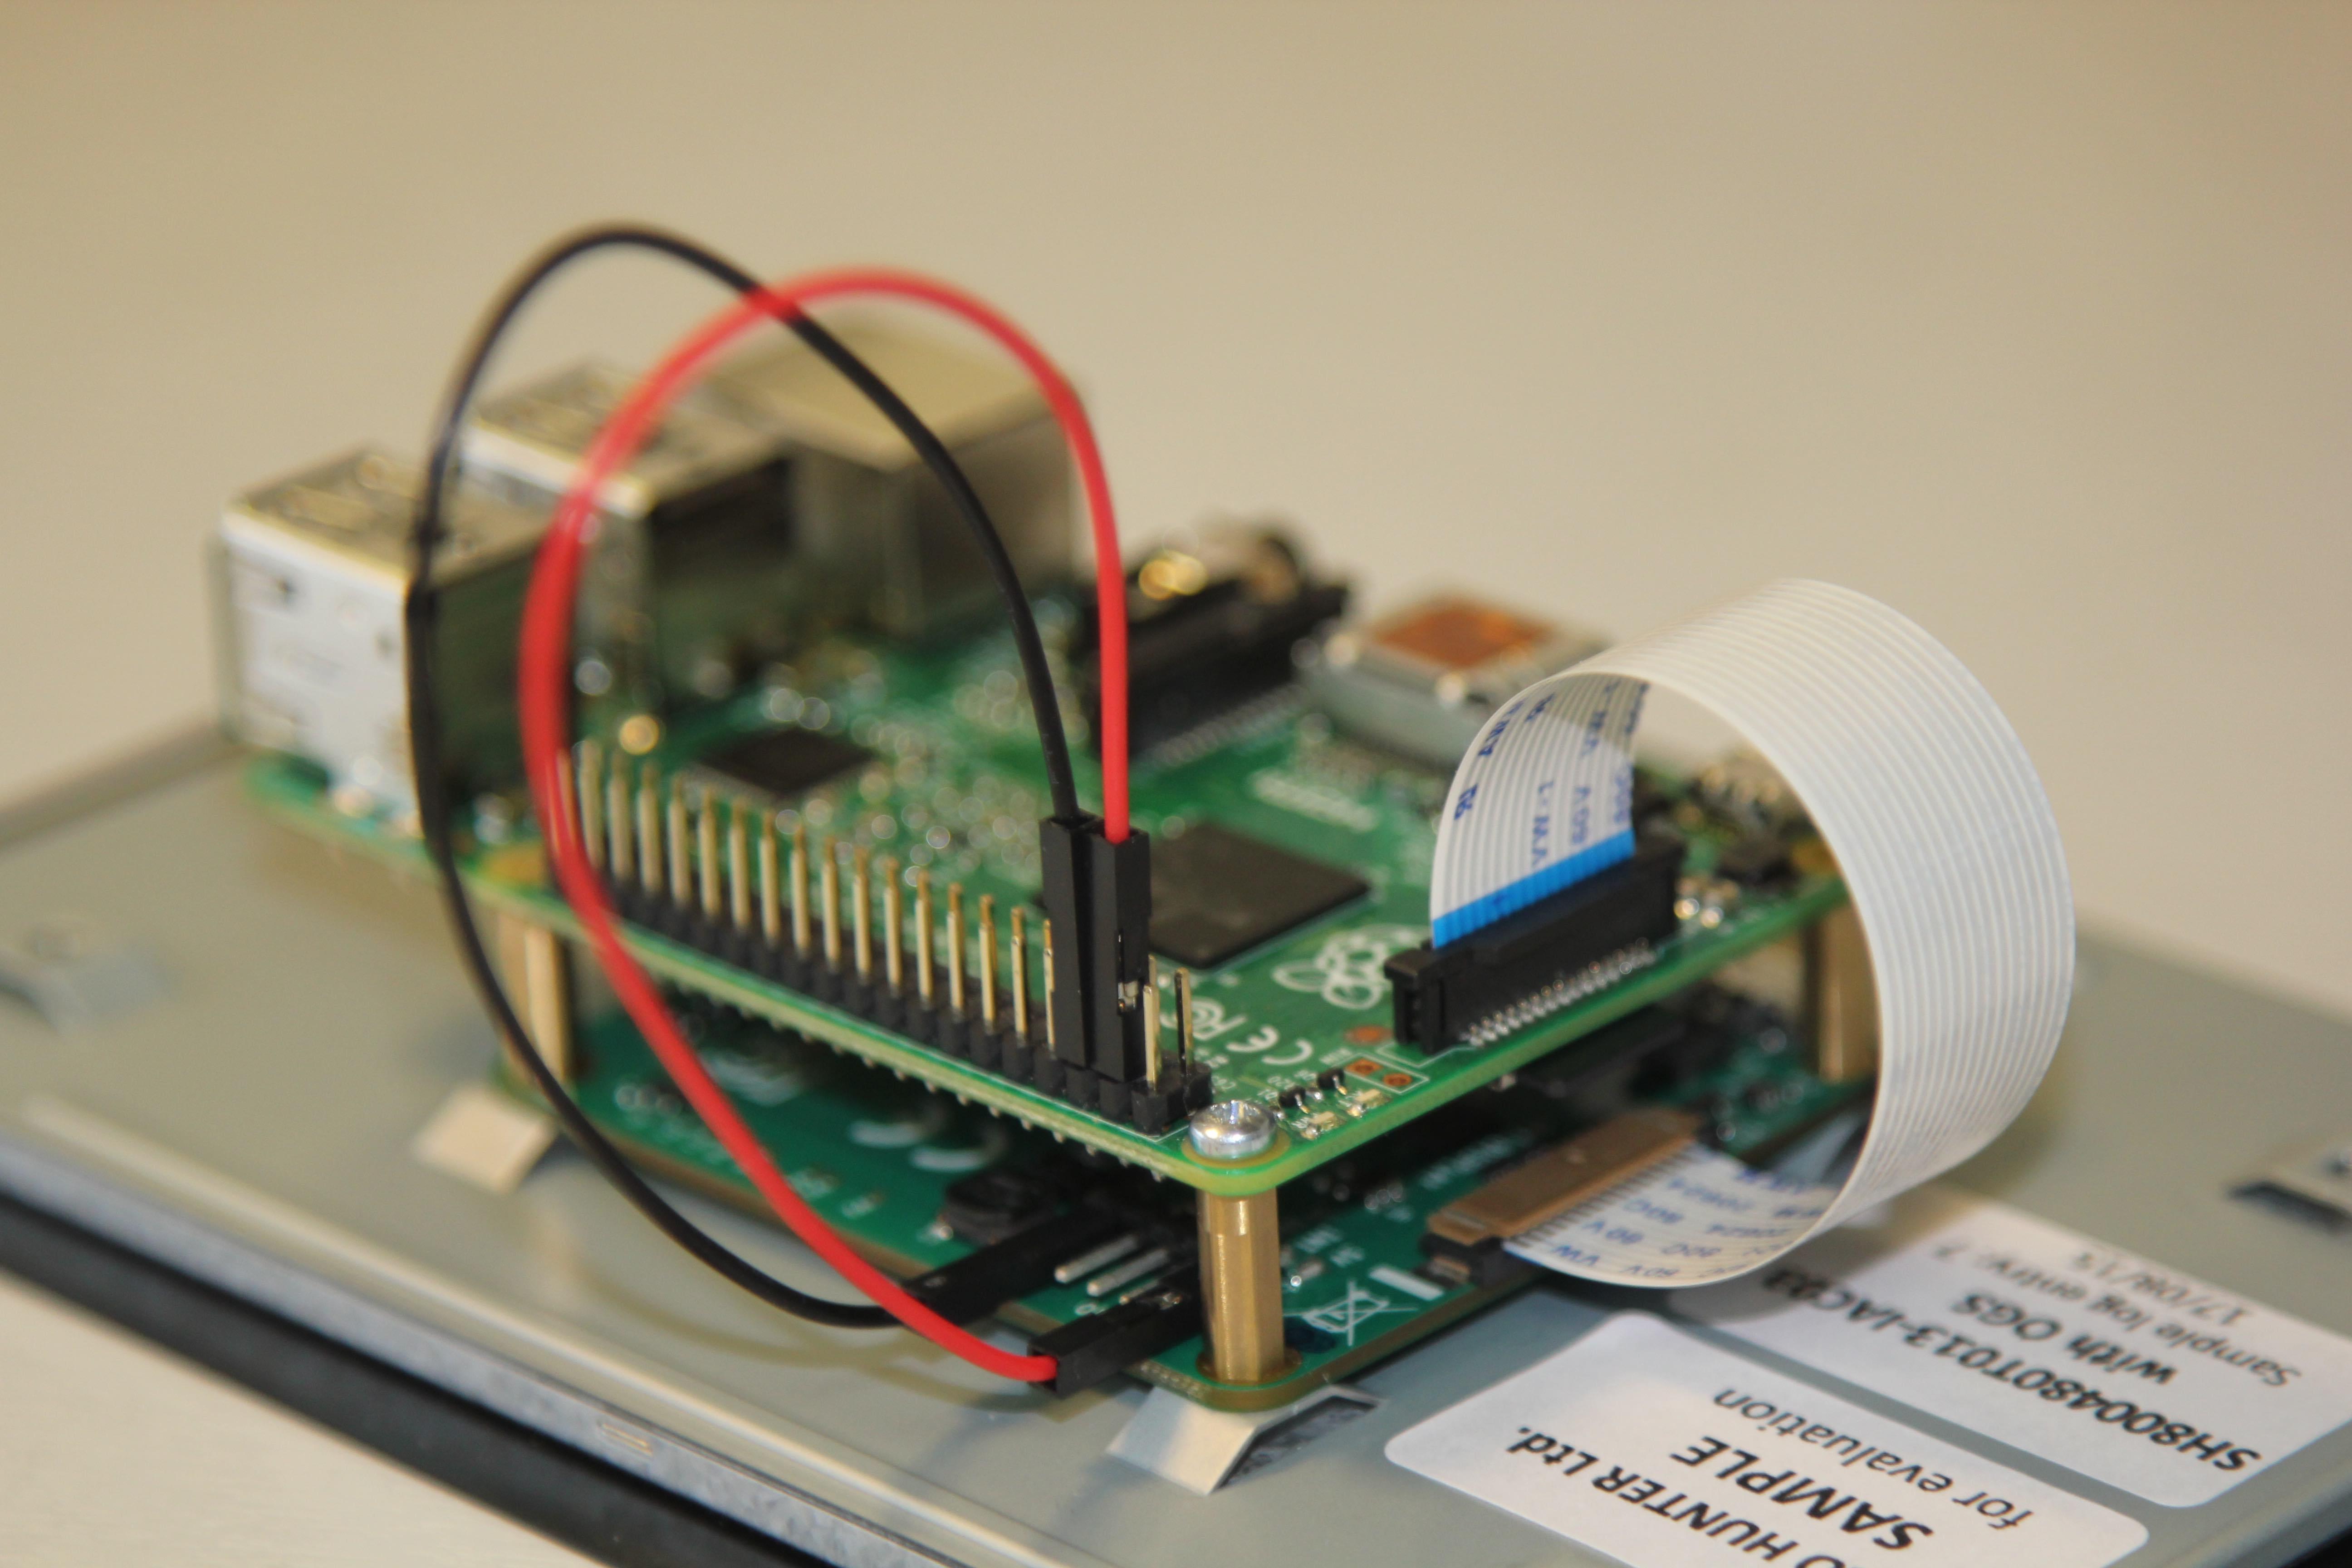 The Eagerly Awaited Raspberry Pi Display